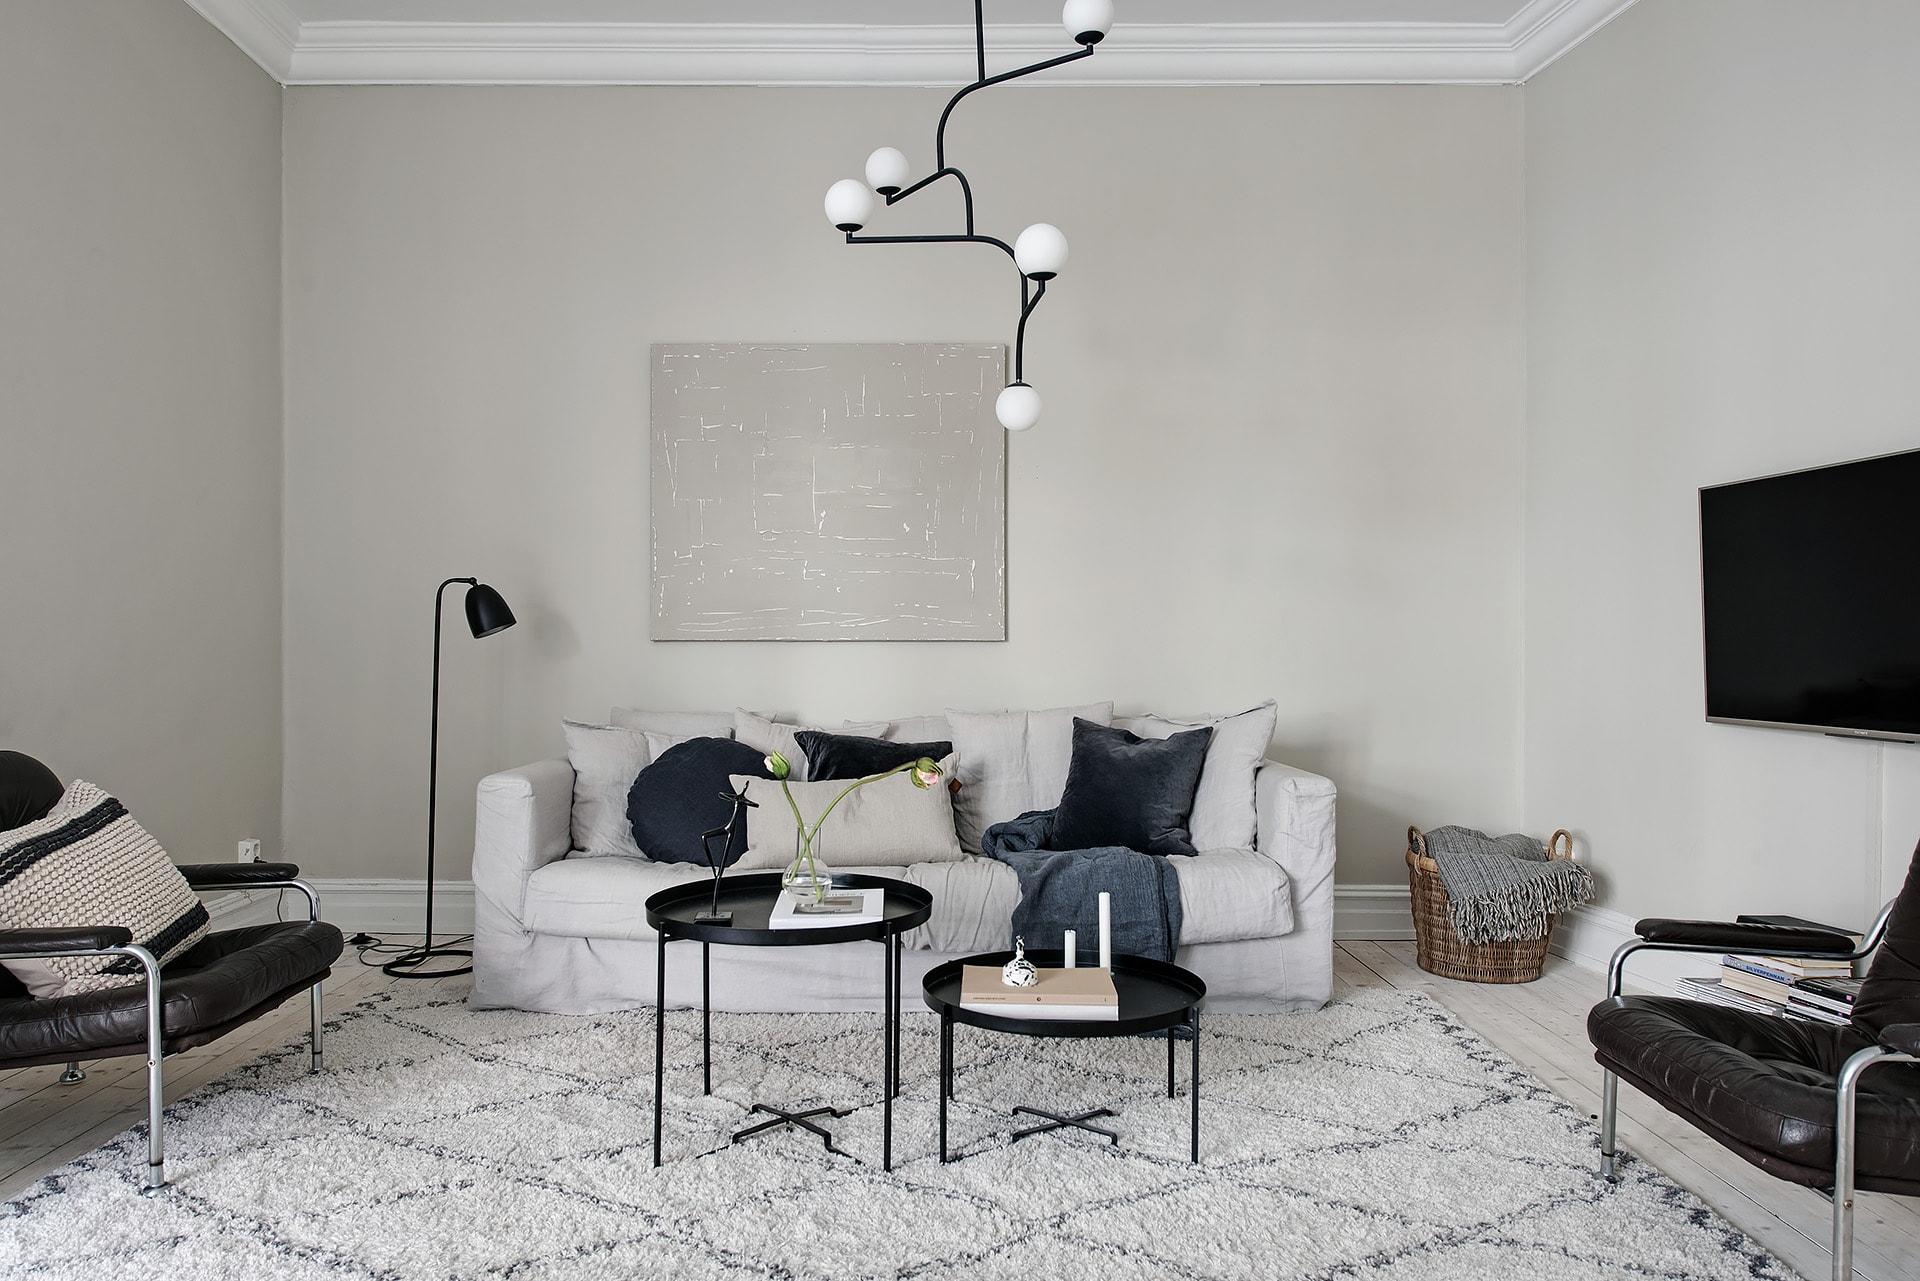 Stylish home in greige - COCO LAPINE DESIGNCOCO LAPINE DESIGN